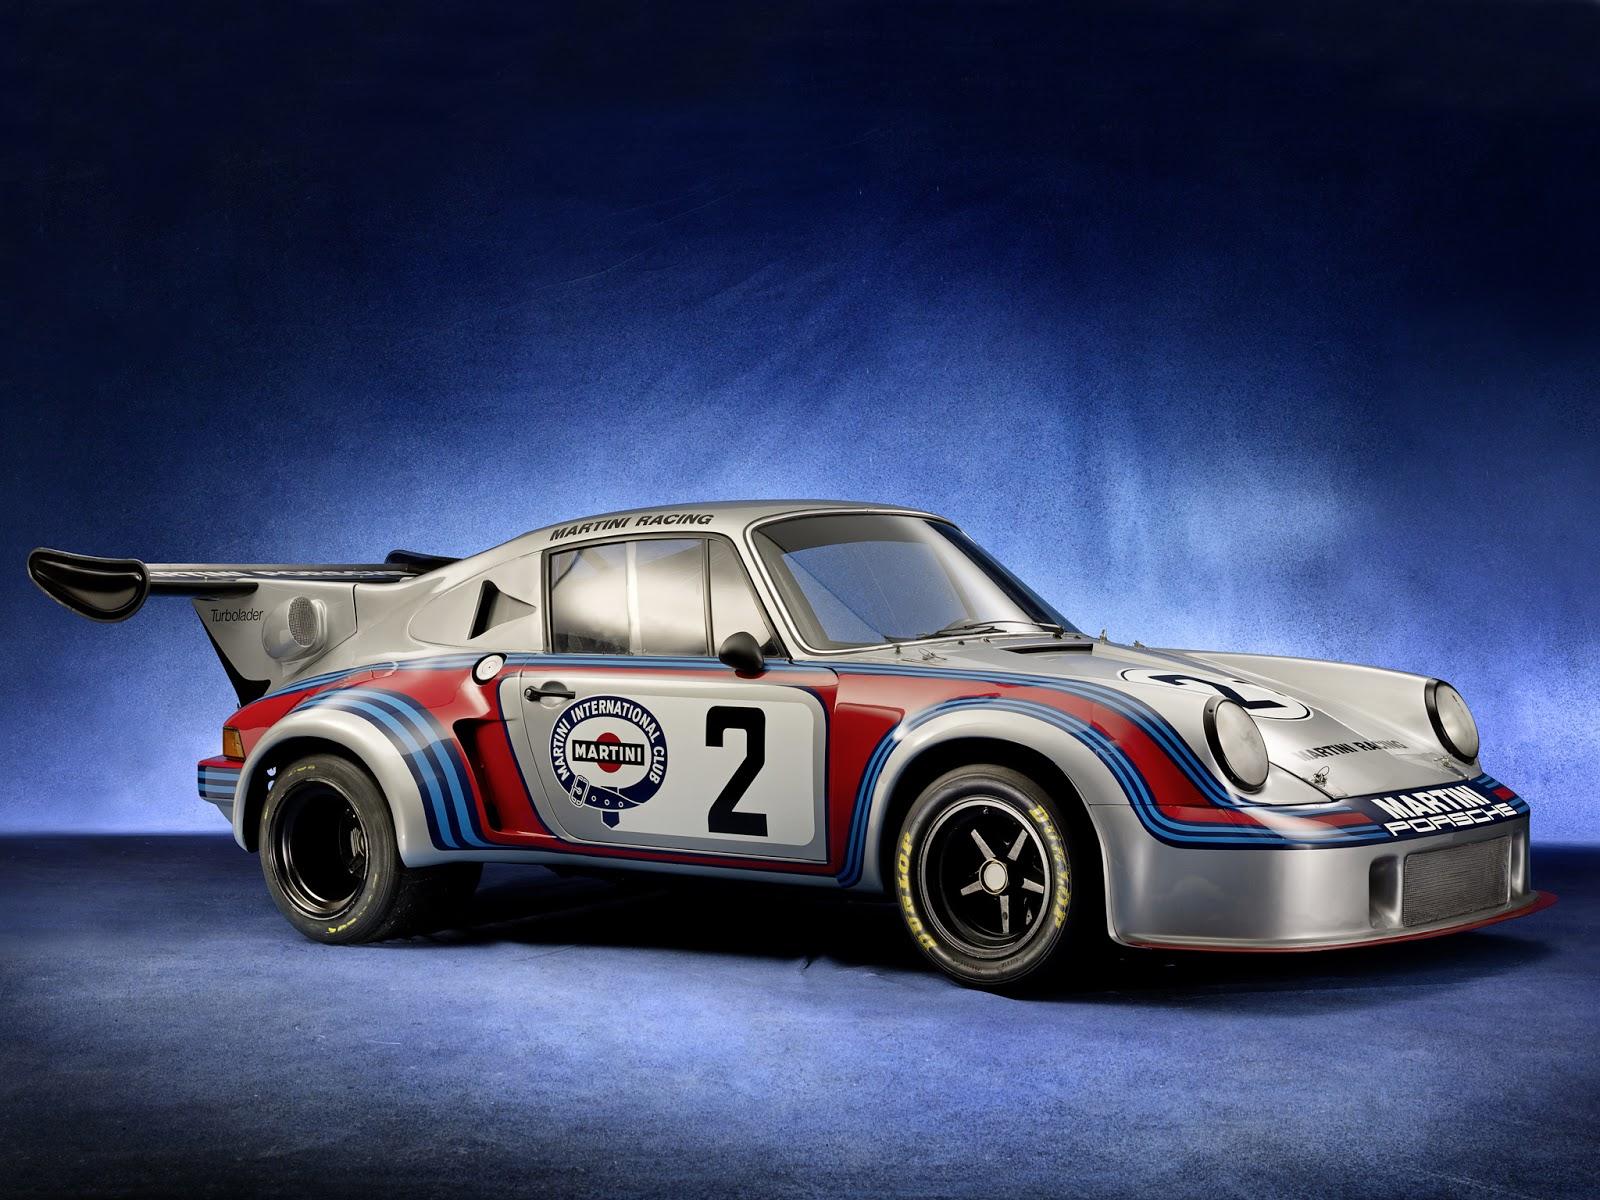 porsche 911 carrera rsr turbo 2 1 autoart 1 18. Black Bedroom Furniture Sets. Home Design Ideas